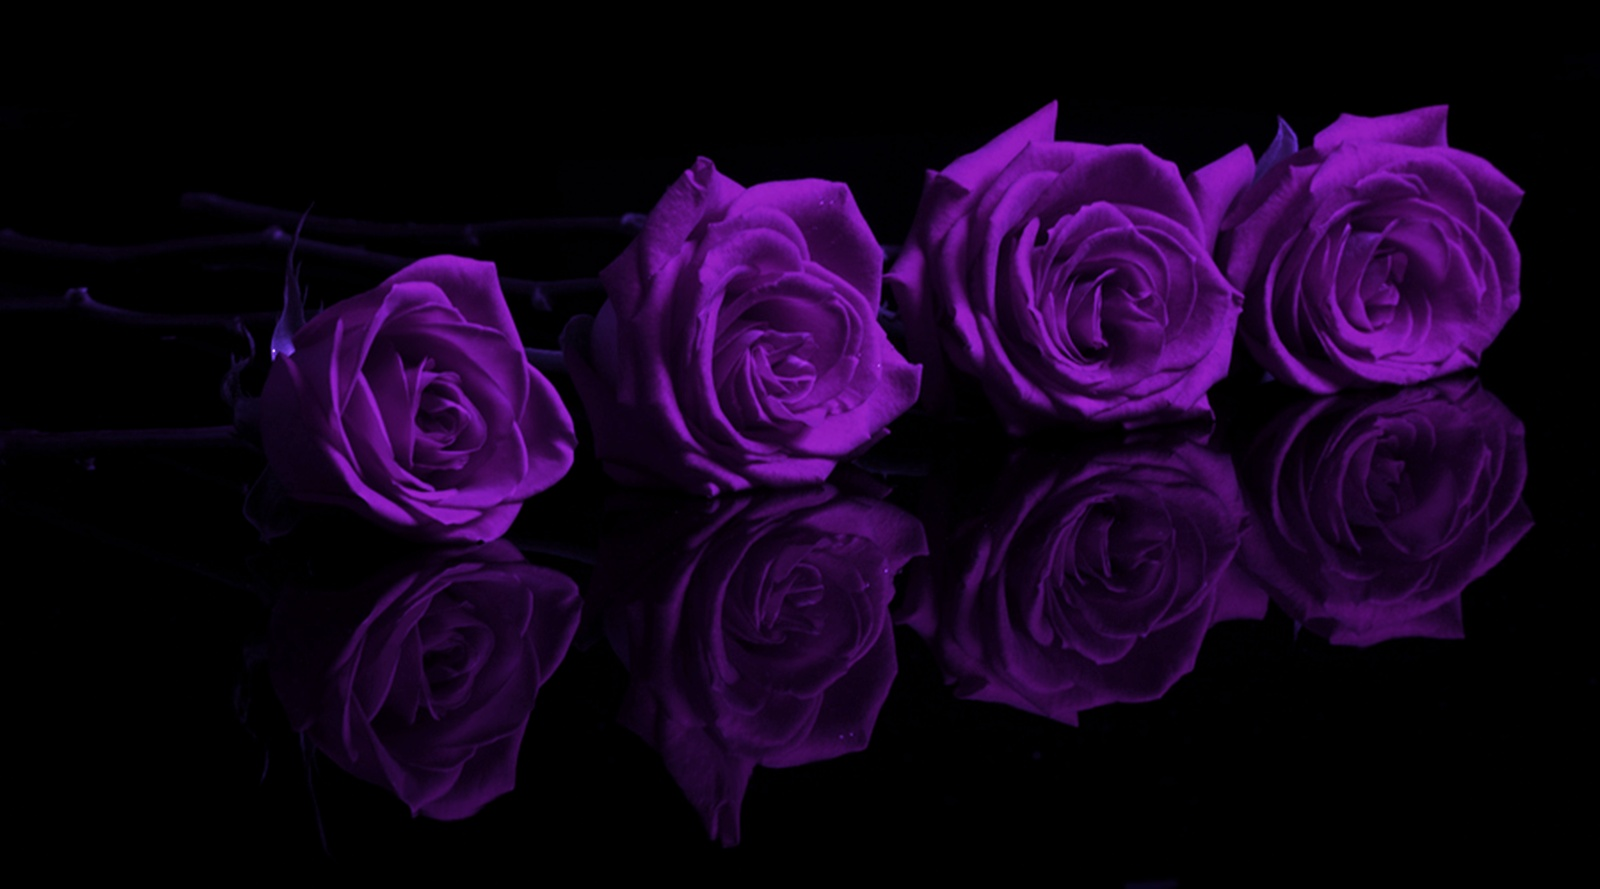 3d Wallpaper Lavender Purple Rose Wallpaper Desktop 12 Widescreen Wallpaper